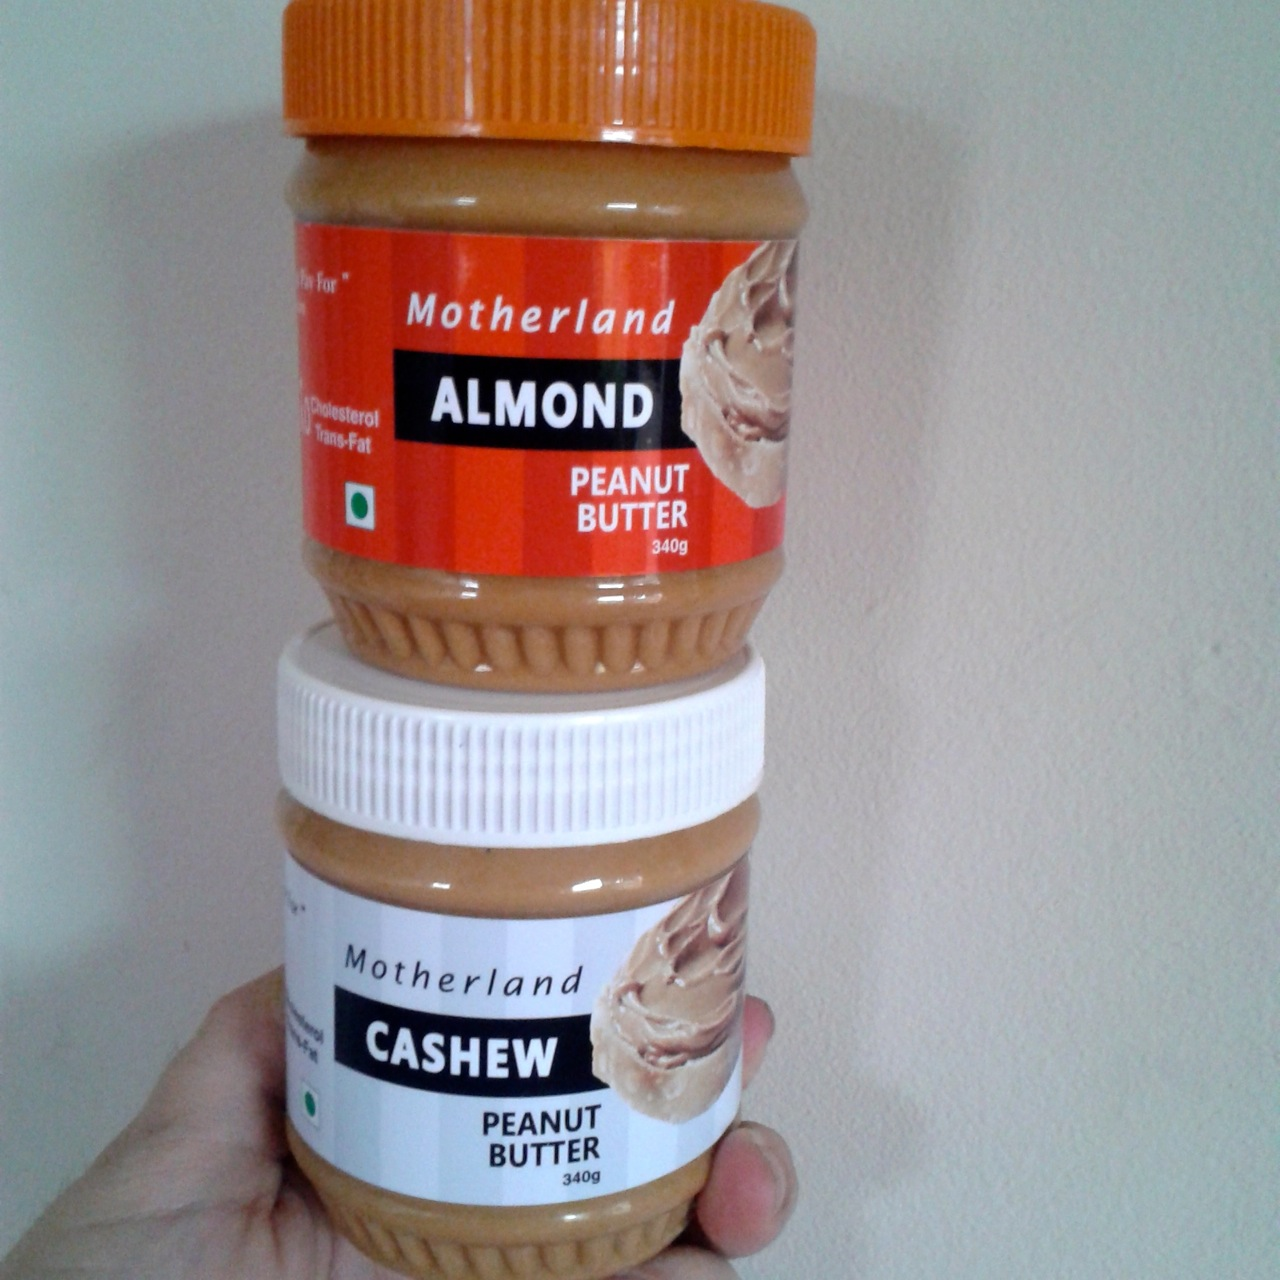 http://i1.wp.com/fatgayvegan.com/wp-content/uploads/2015/04/peanut-butter.jpg?fit=1280%2C1280